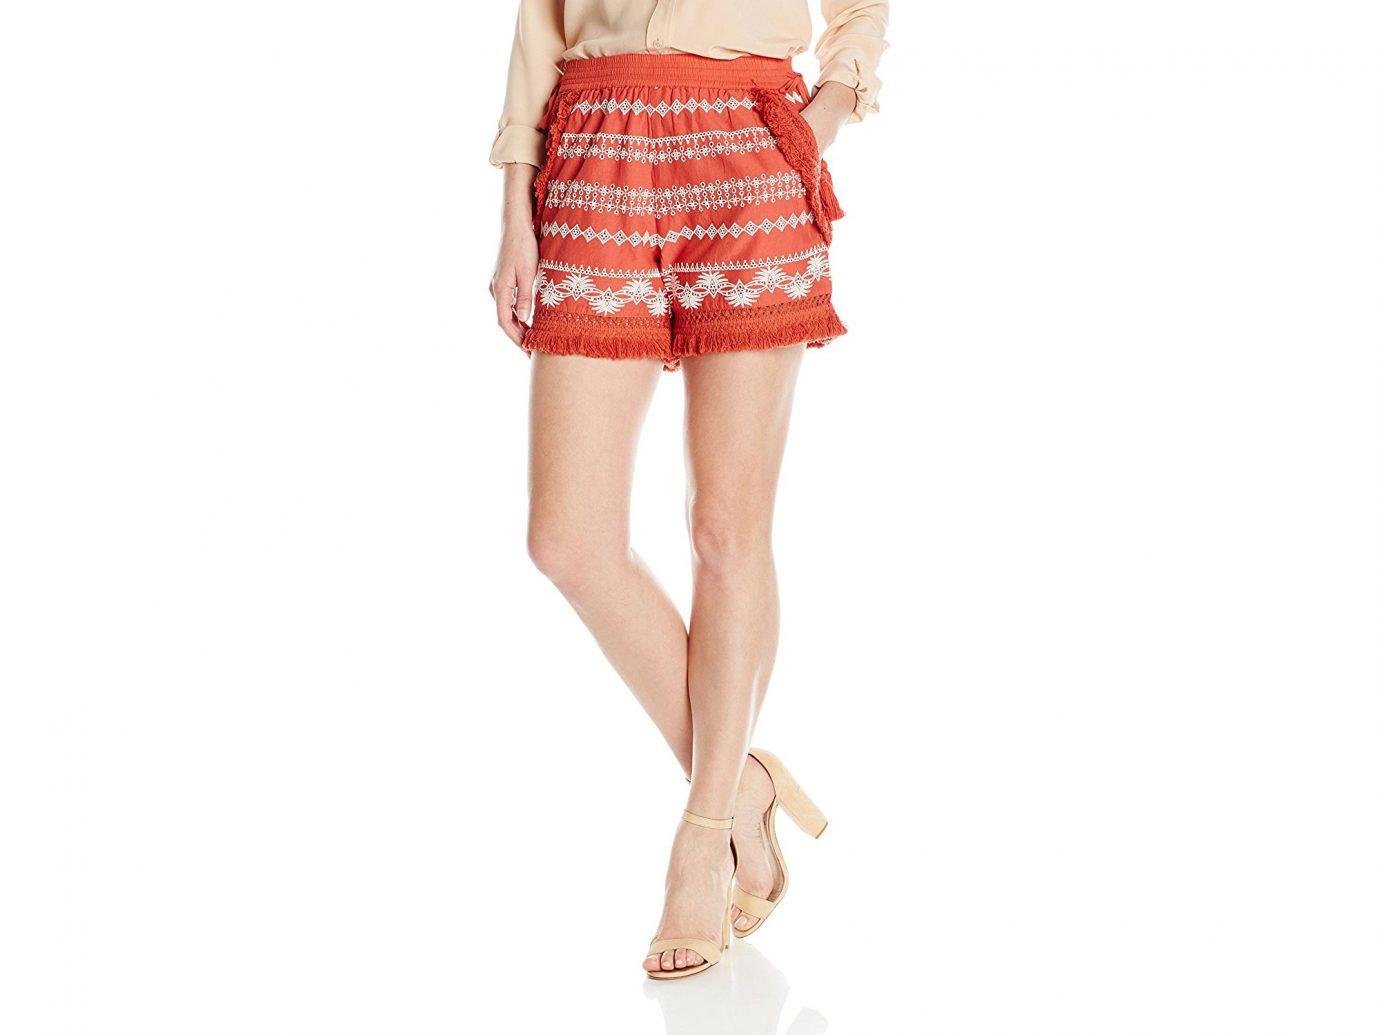 Rachel Zoe Karlene Shorts